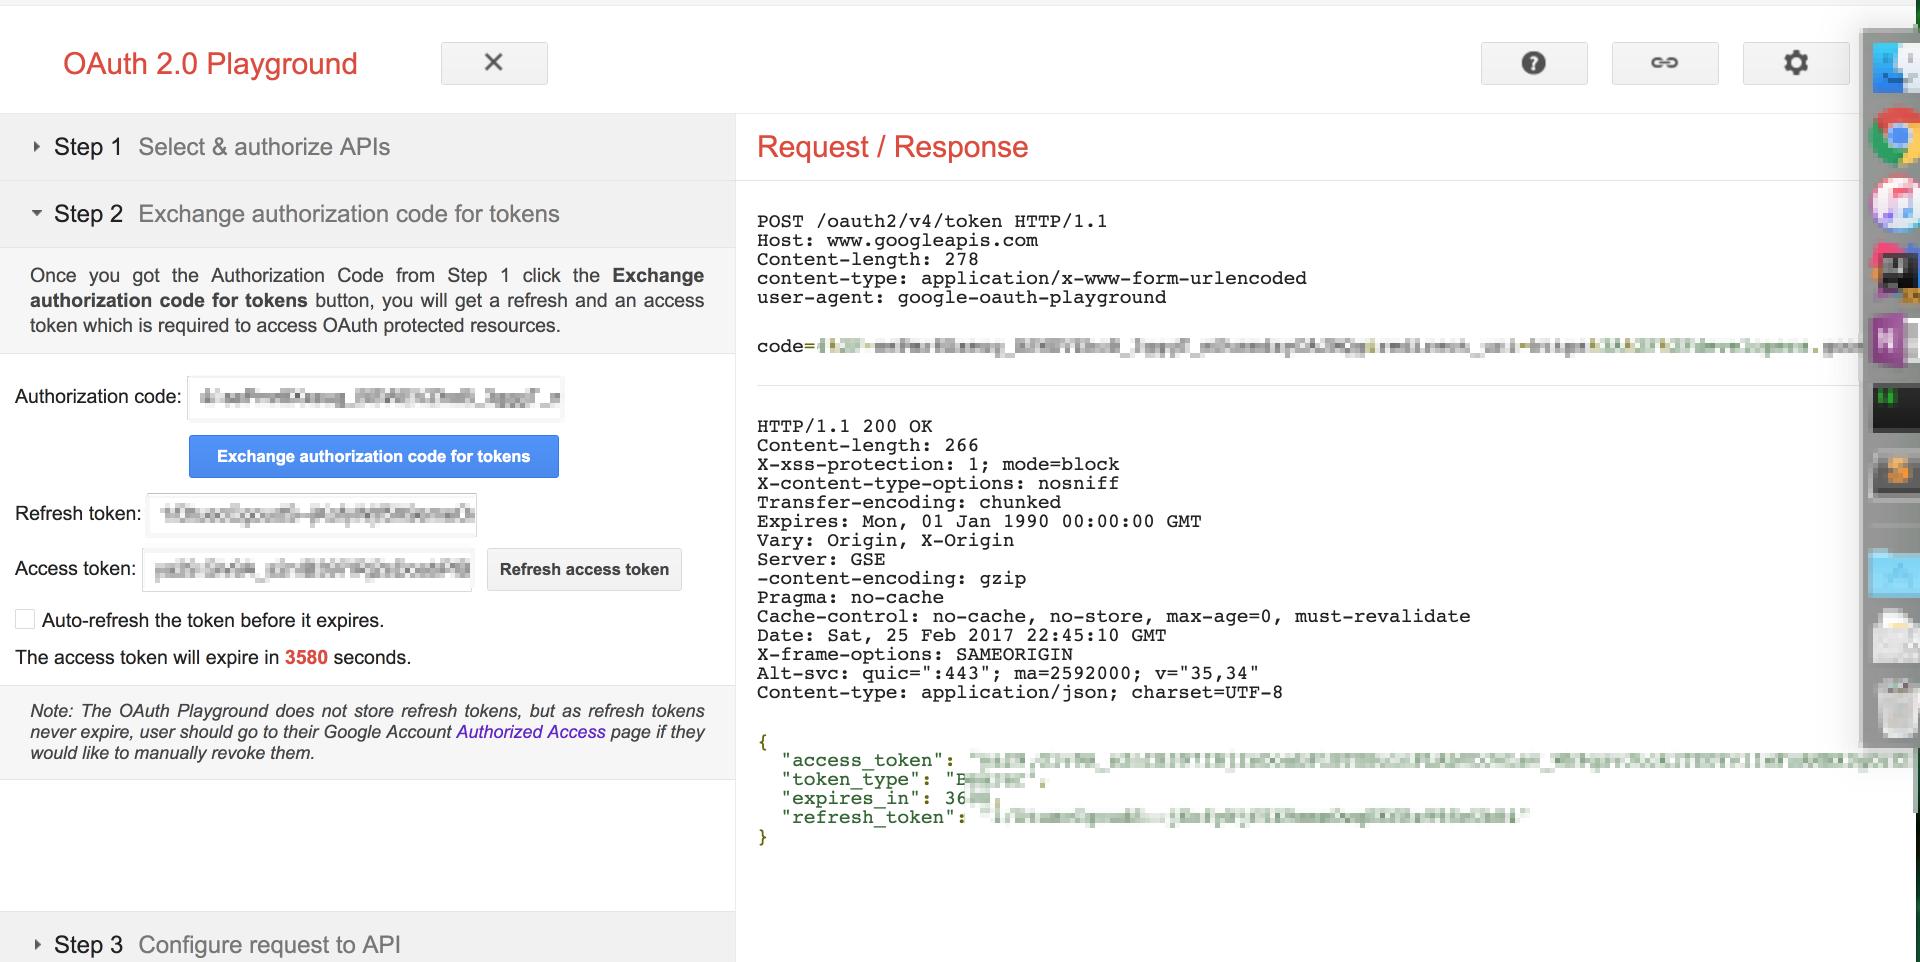 GOOGLE TRANSLATE API ERROR CODE 403 - How To Set Up Google